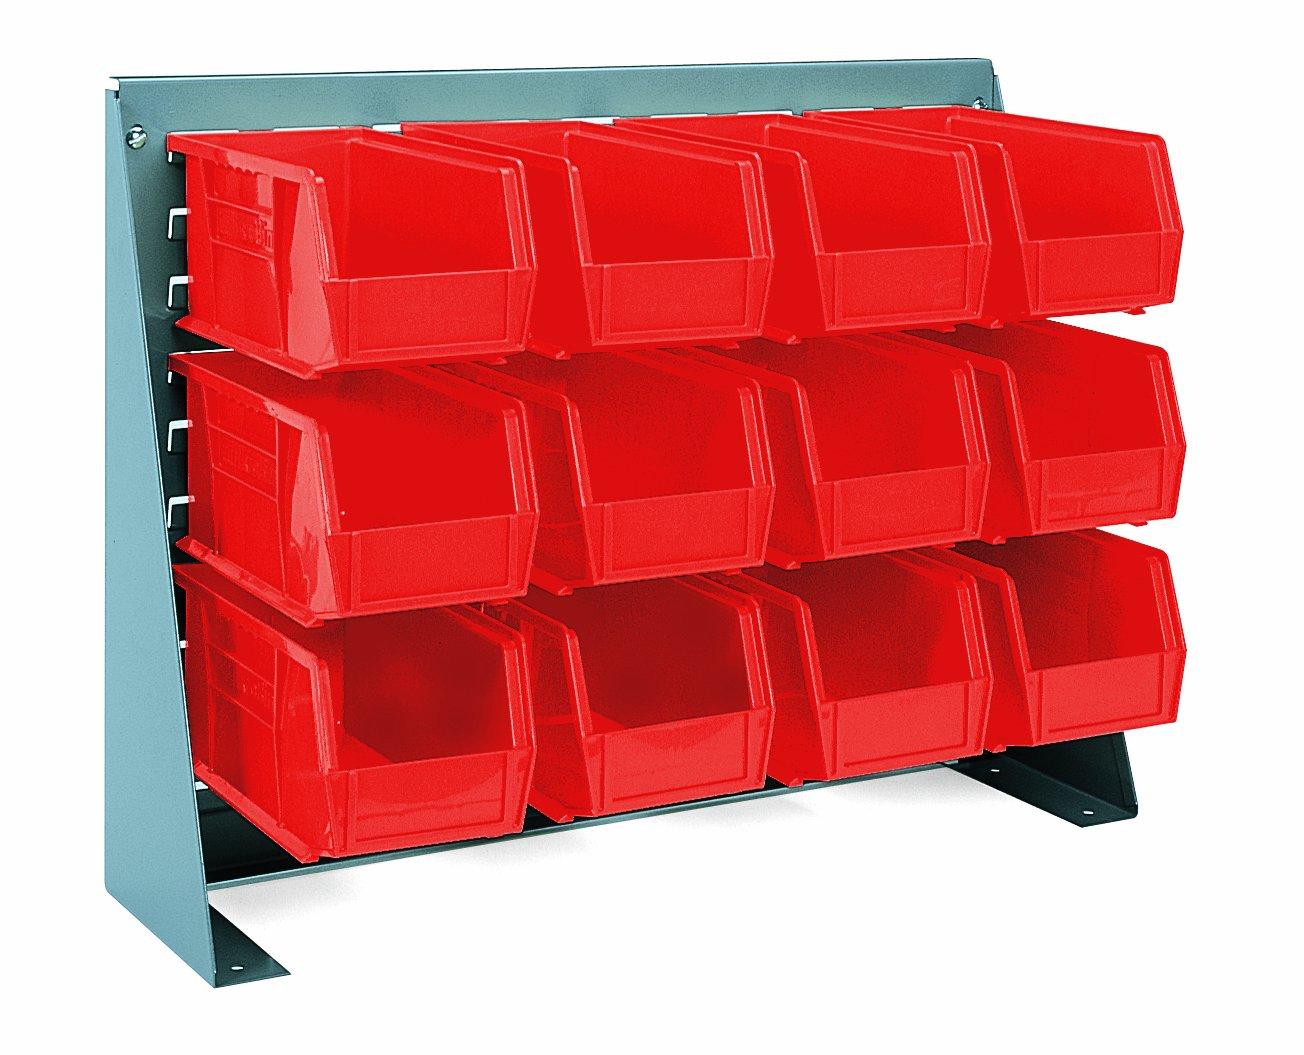 Akro-Mils 96380 Louvered Panel Work Bench Rack and Plastic Hanging Bin Set